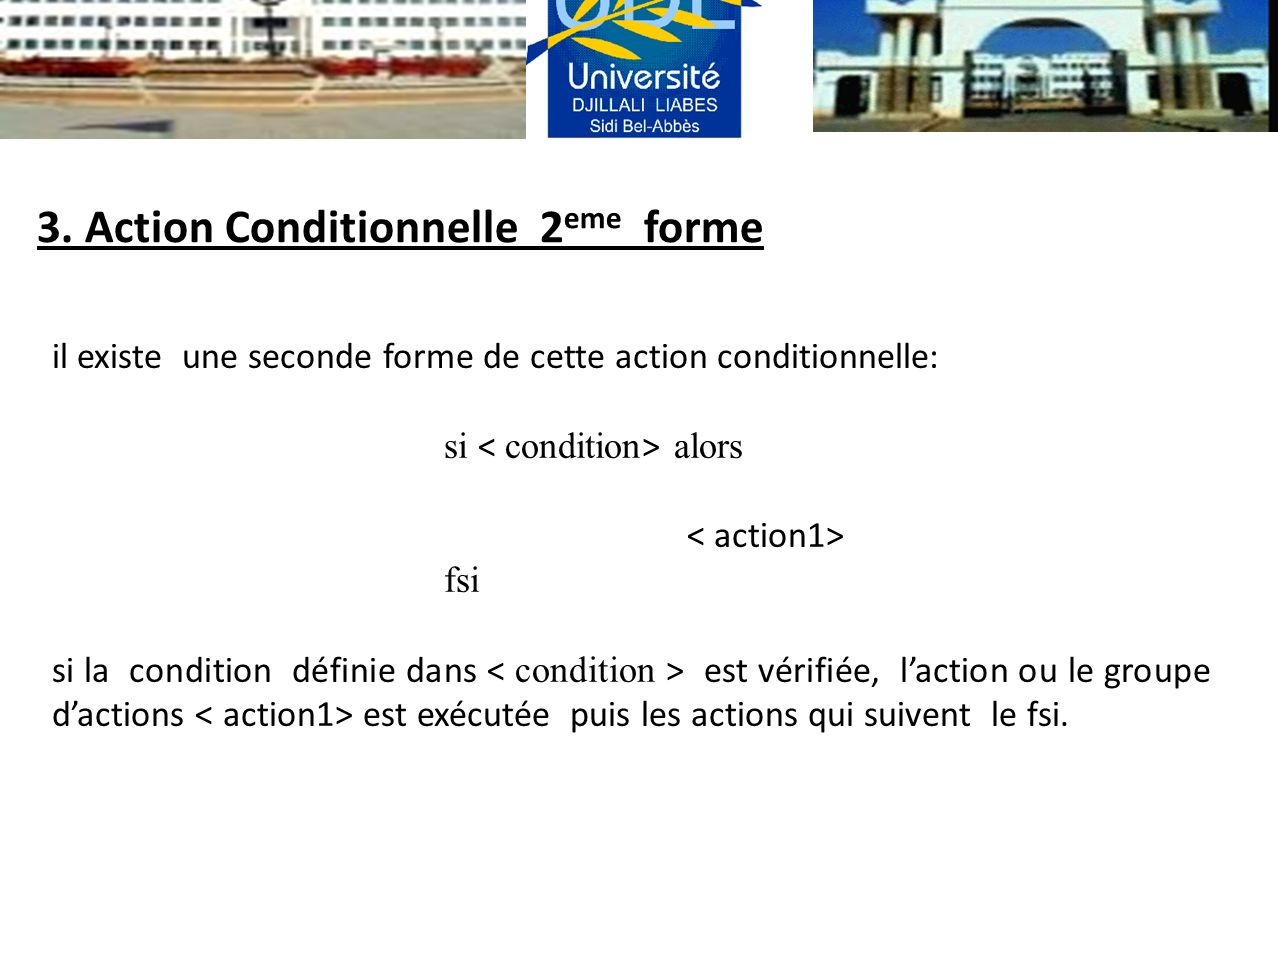 3. Action Conditionnelle 2eme forme